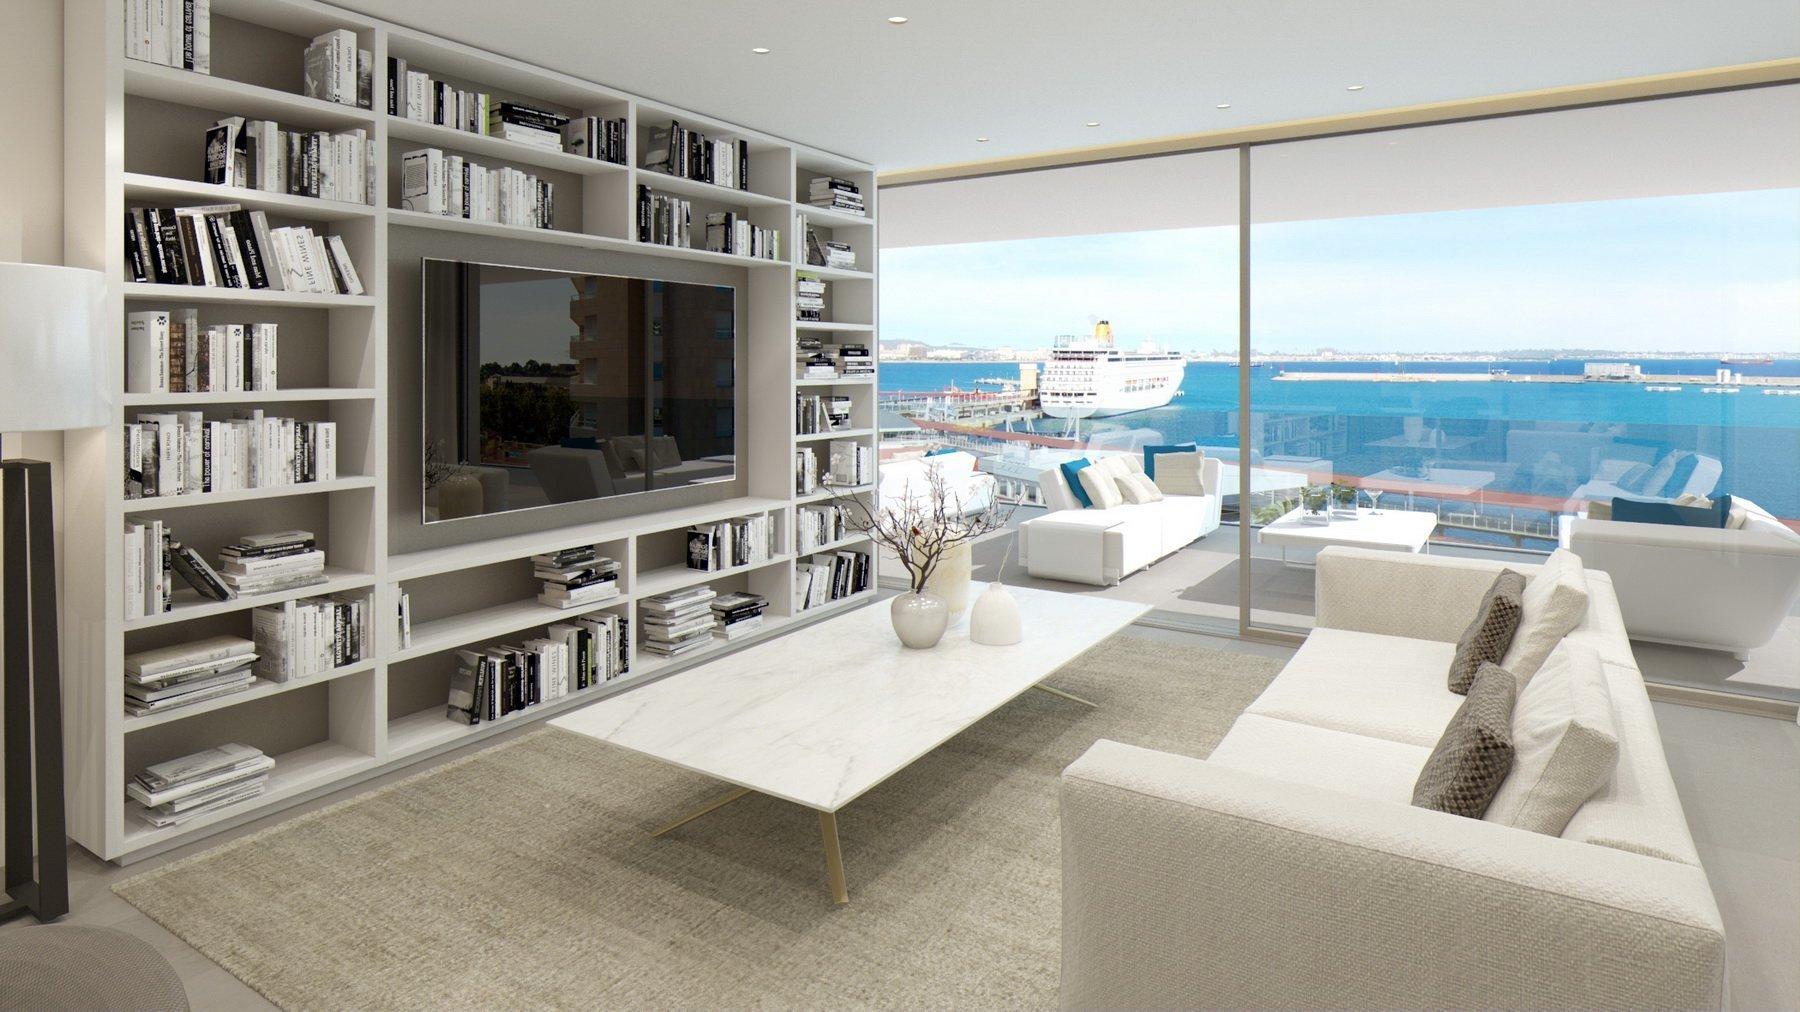 Apartment in Palma, Balearic Islands, Spain 1